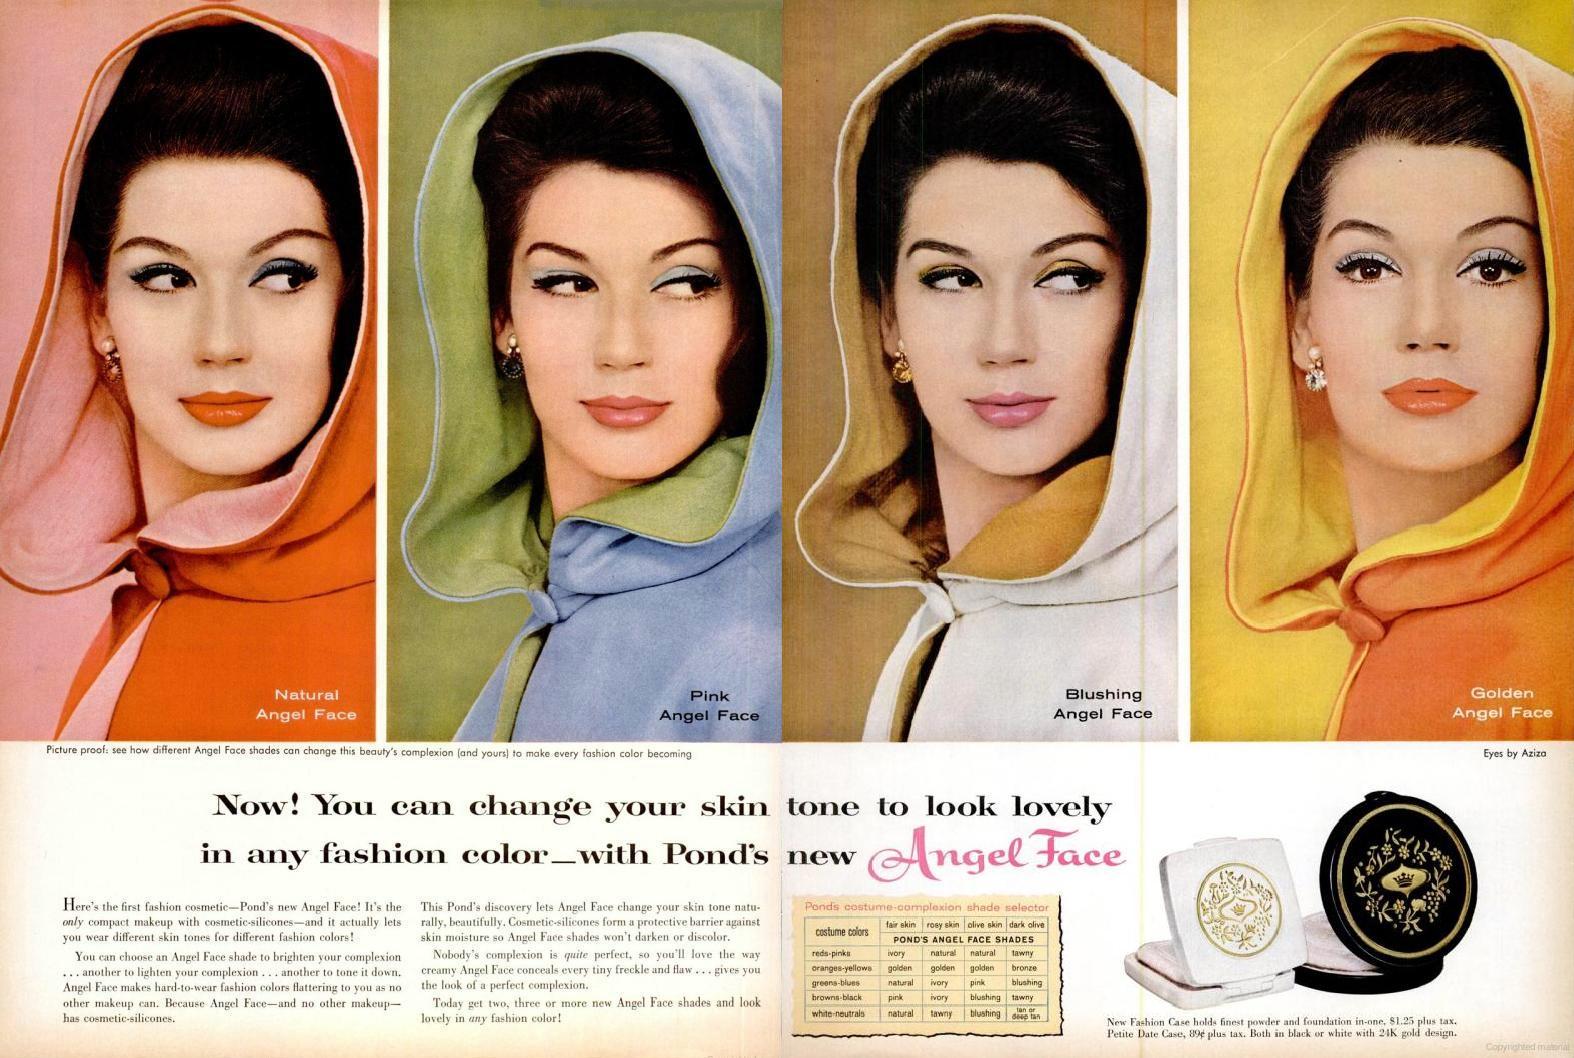 LIFE Sep 19, 1960 angel face skin tone makeup spread